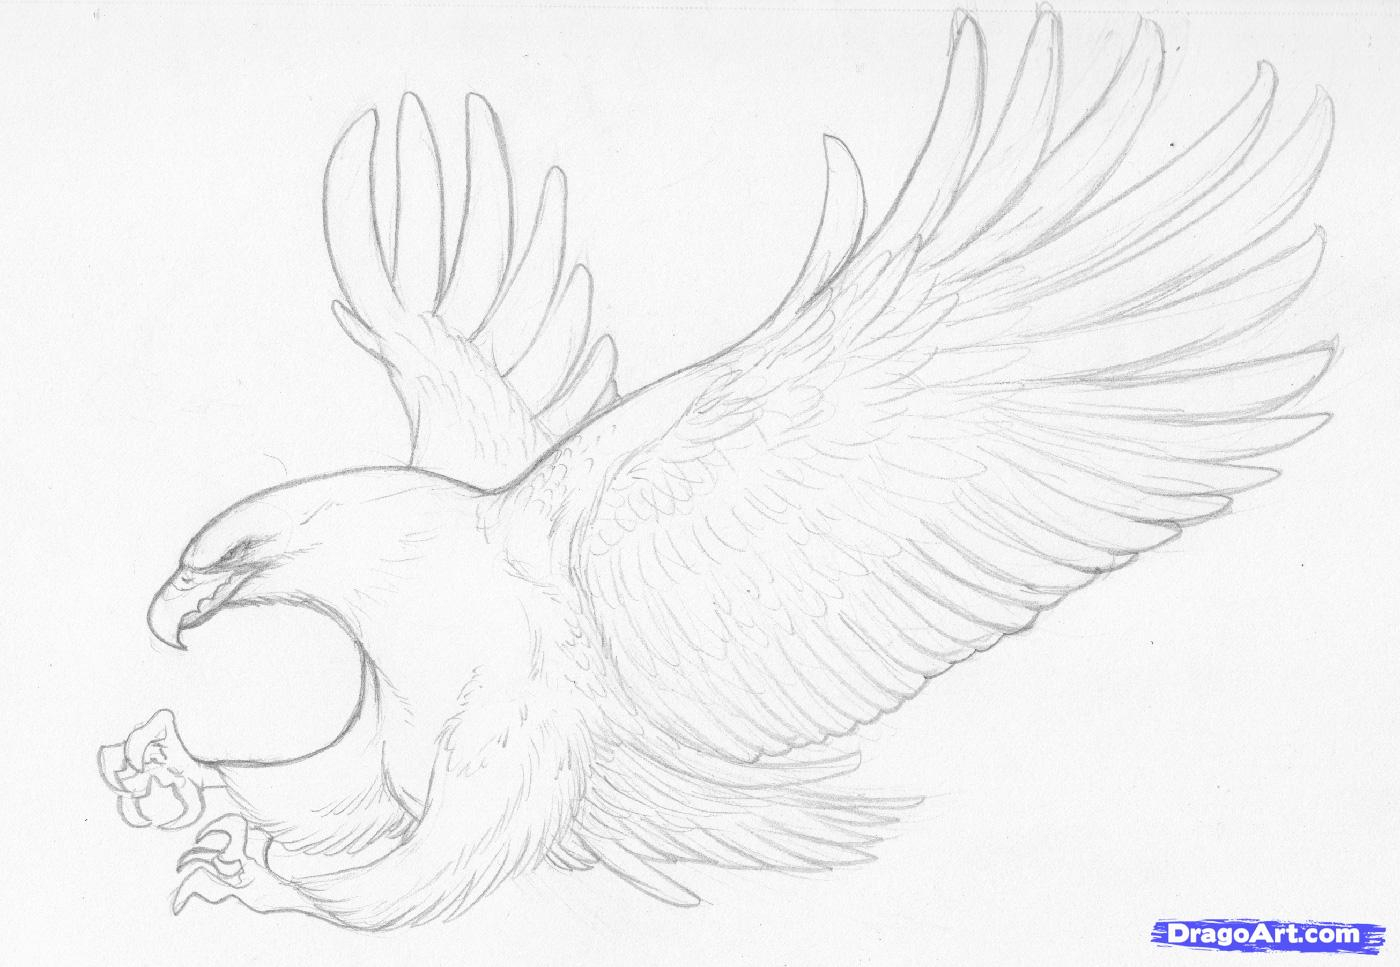 1400x967 Pencil Sketching Of Eagles